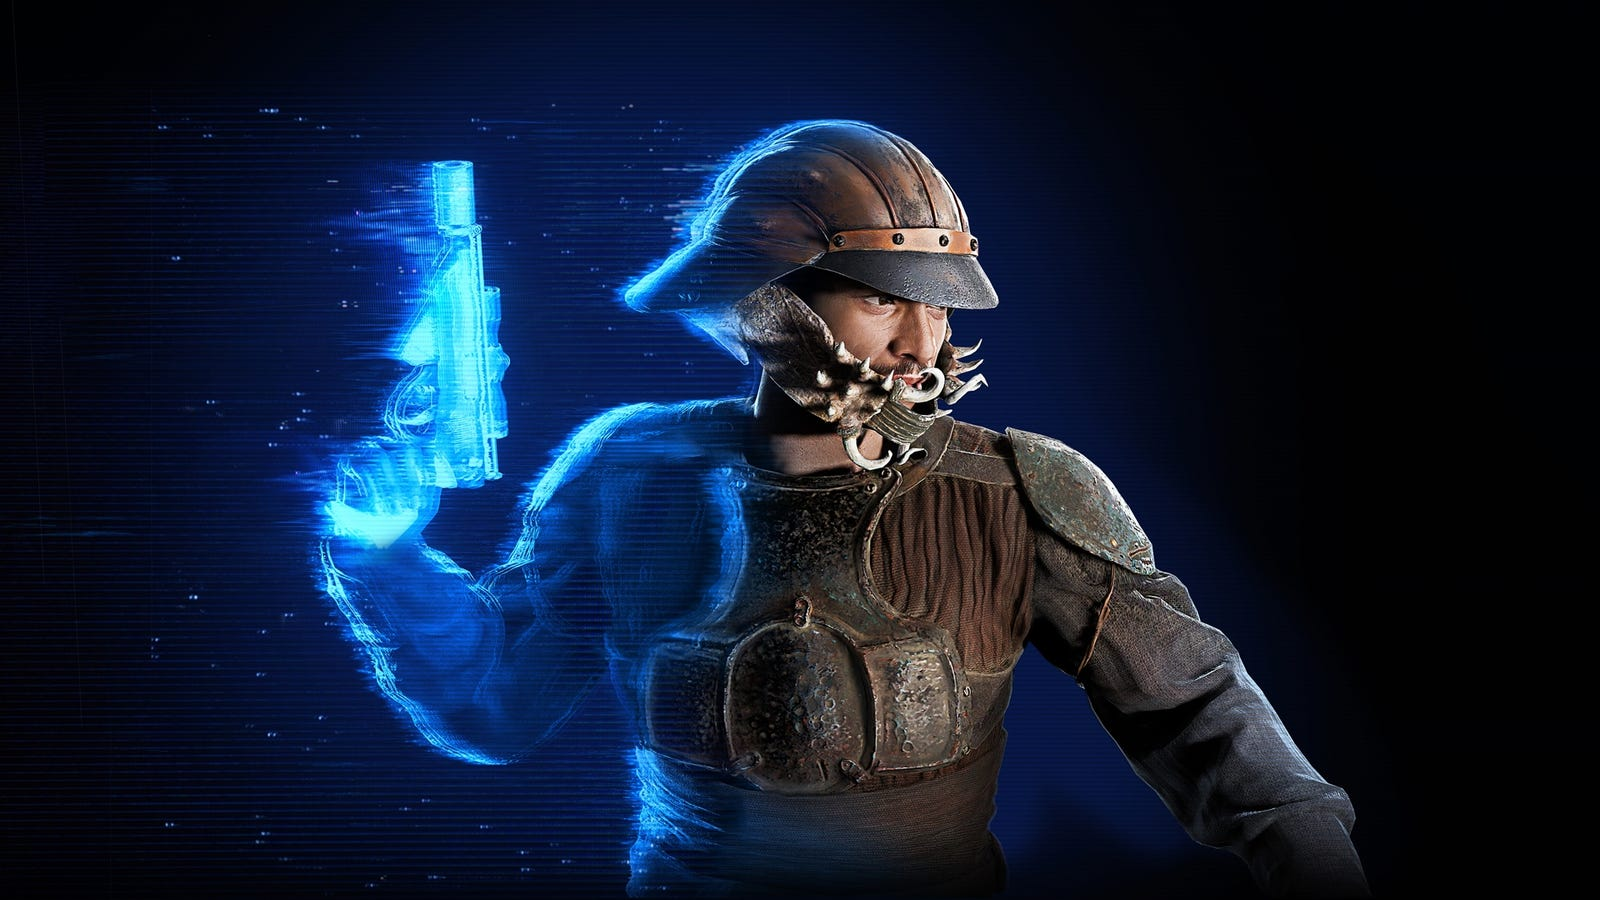 Lando's new appearance